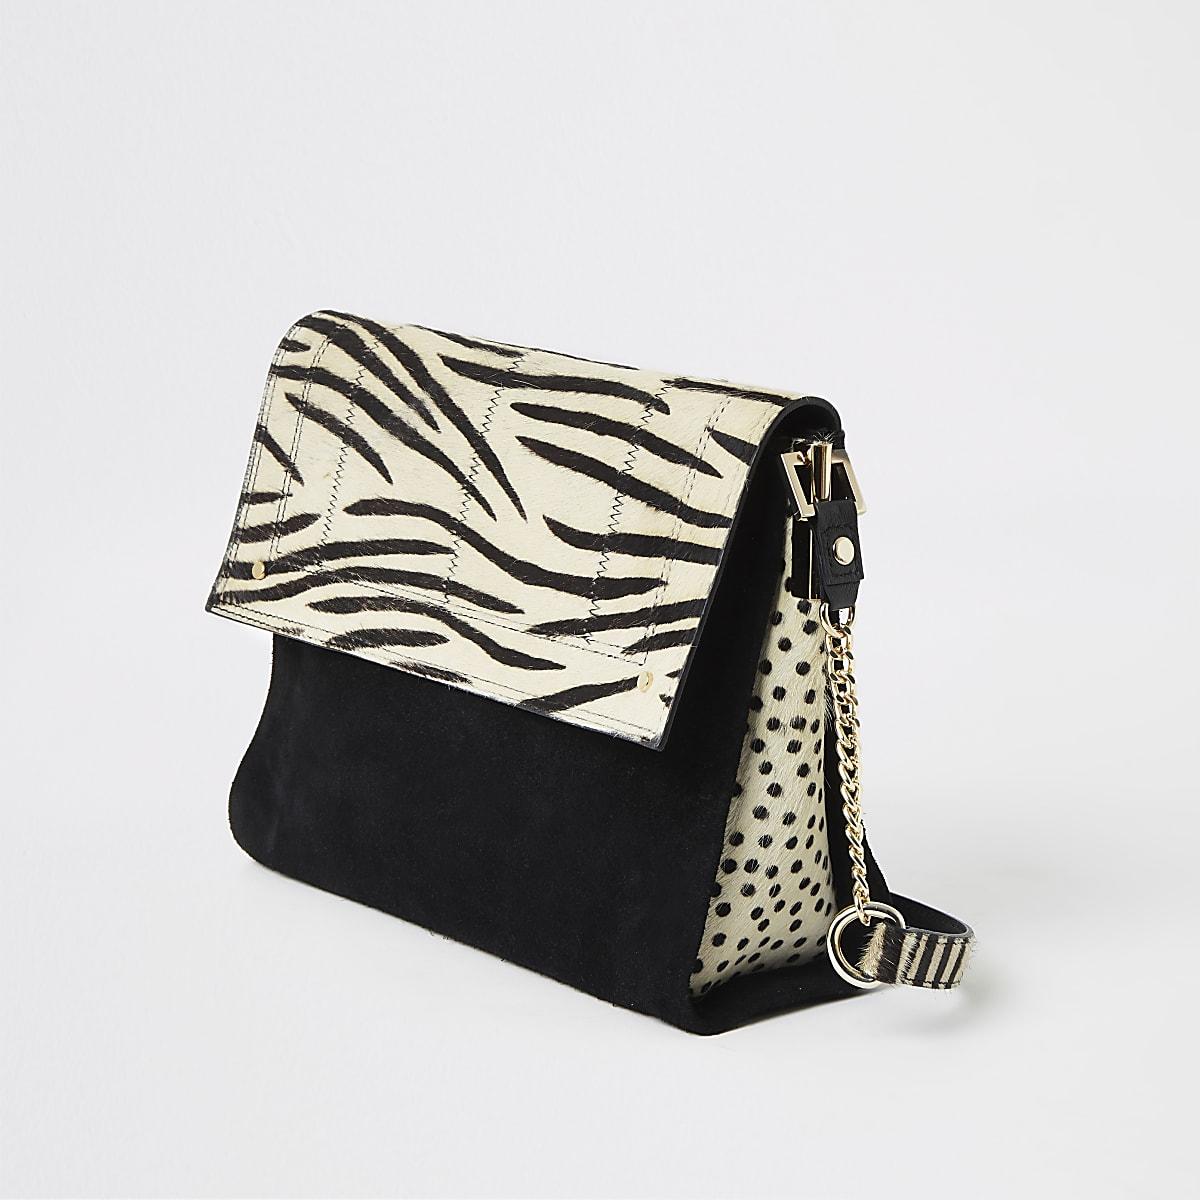 Black Leather Zebra Print Underarm Bag